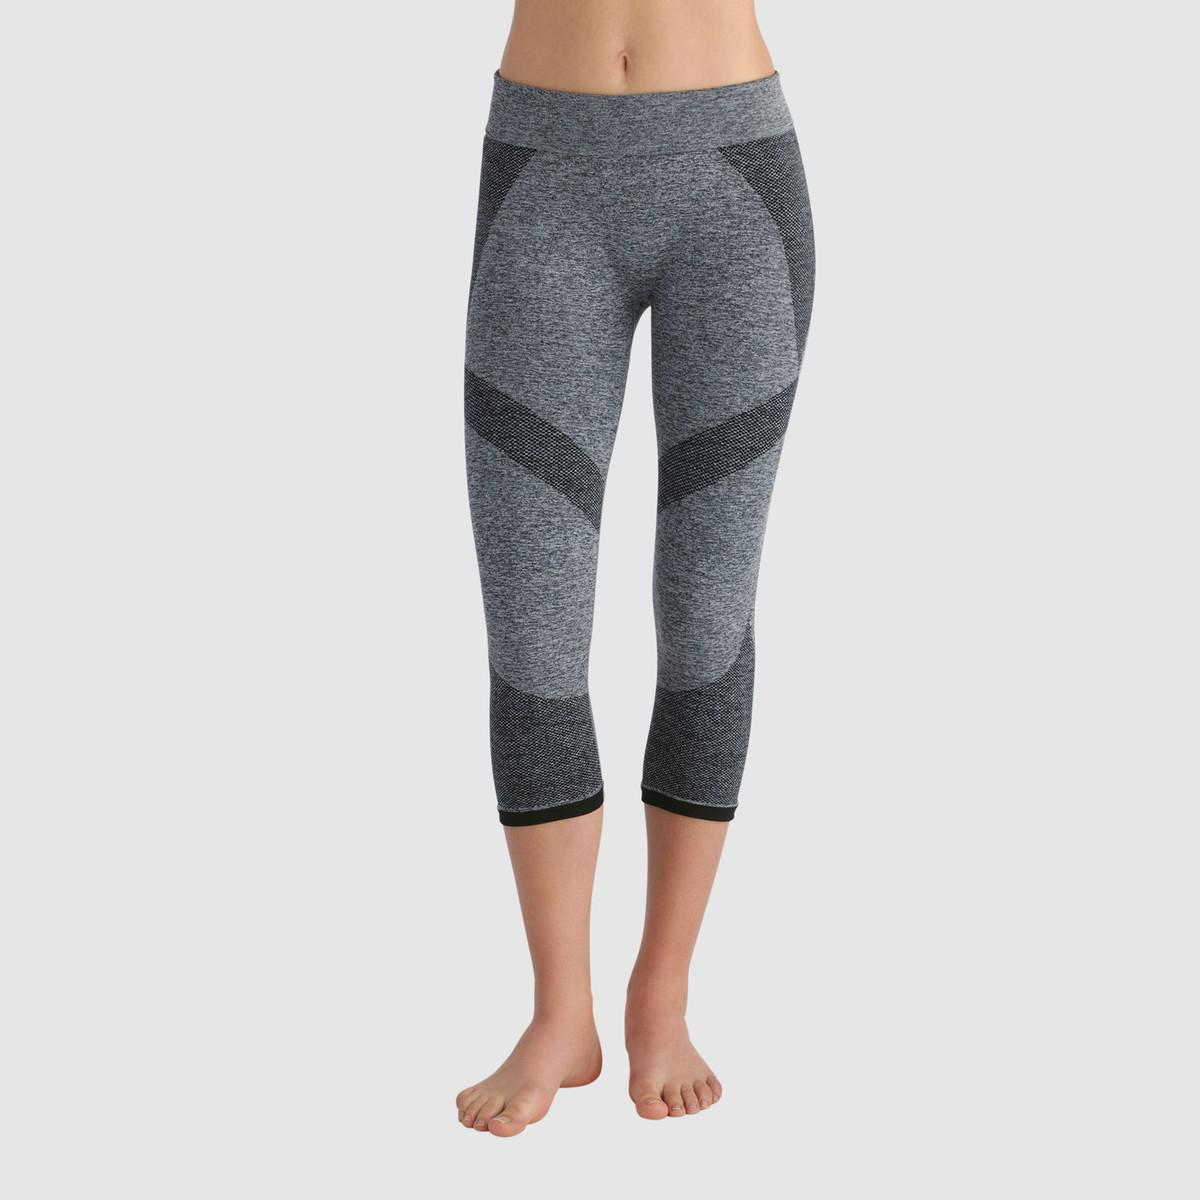 b1243a0ac7389 Legging dim - Idéesvêtement femme